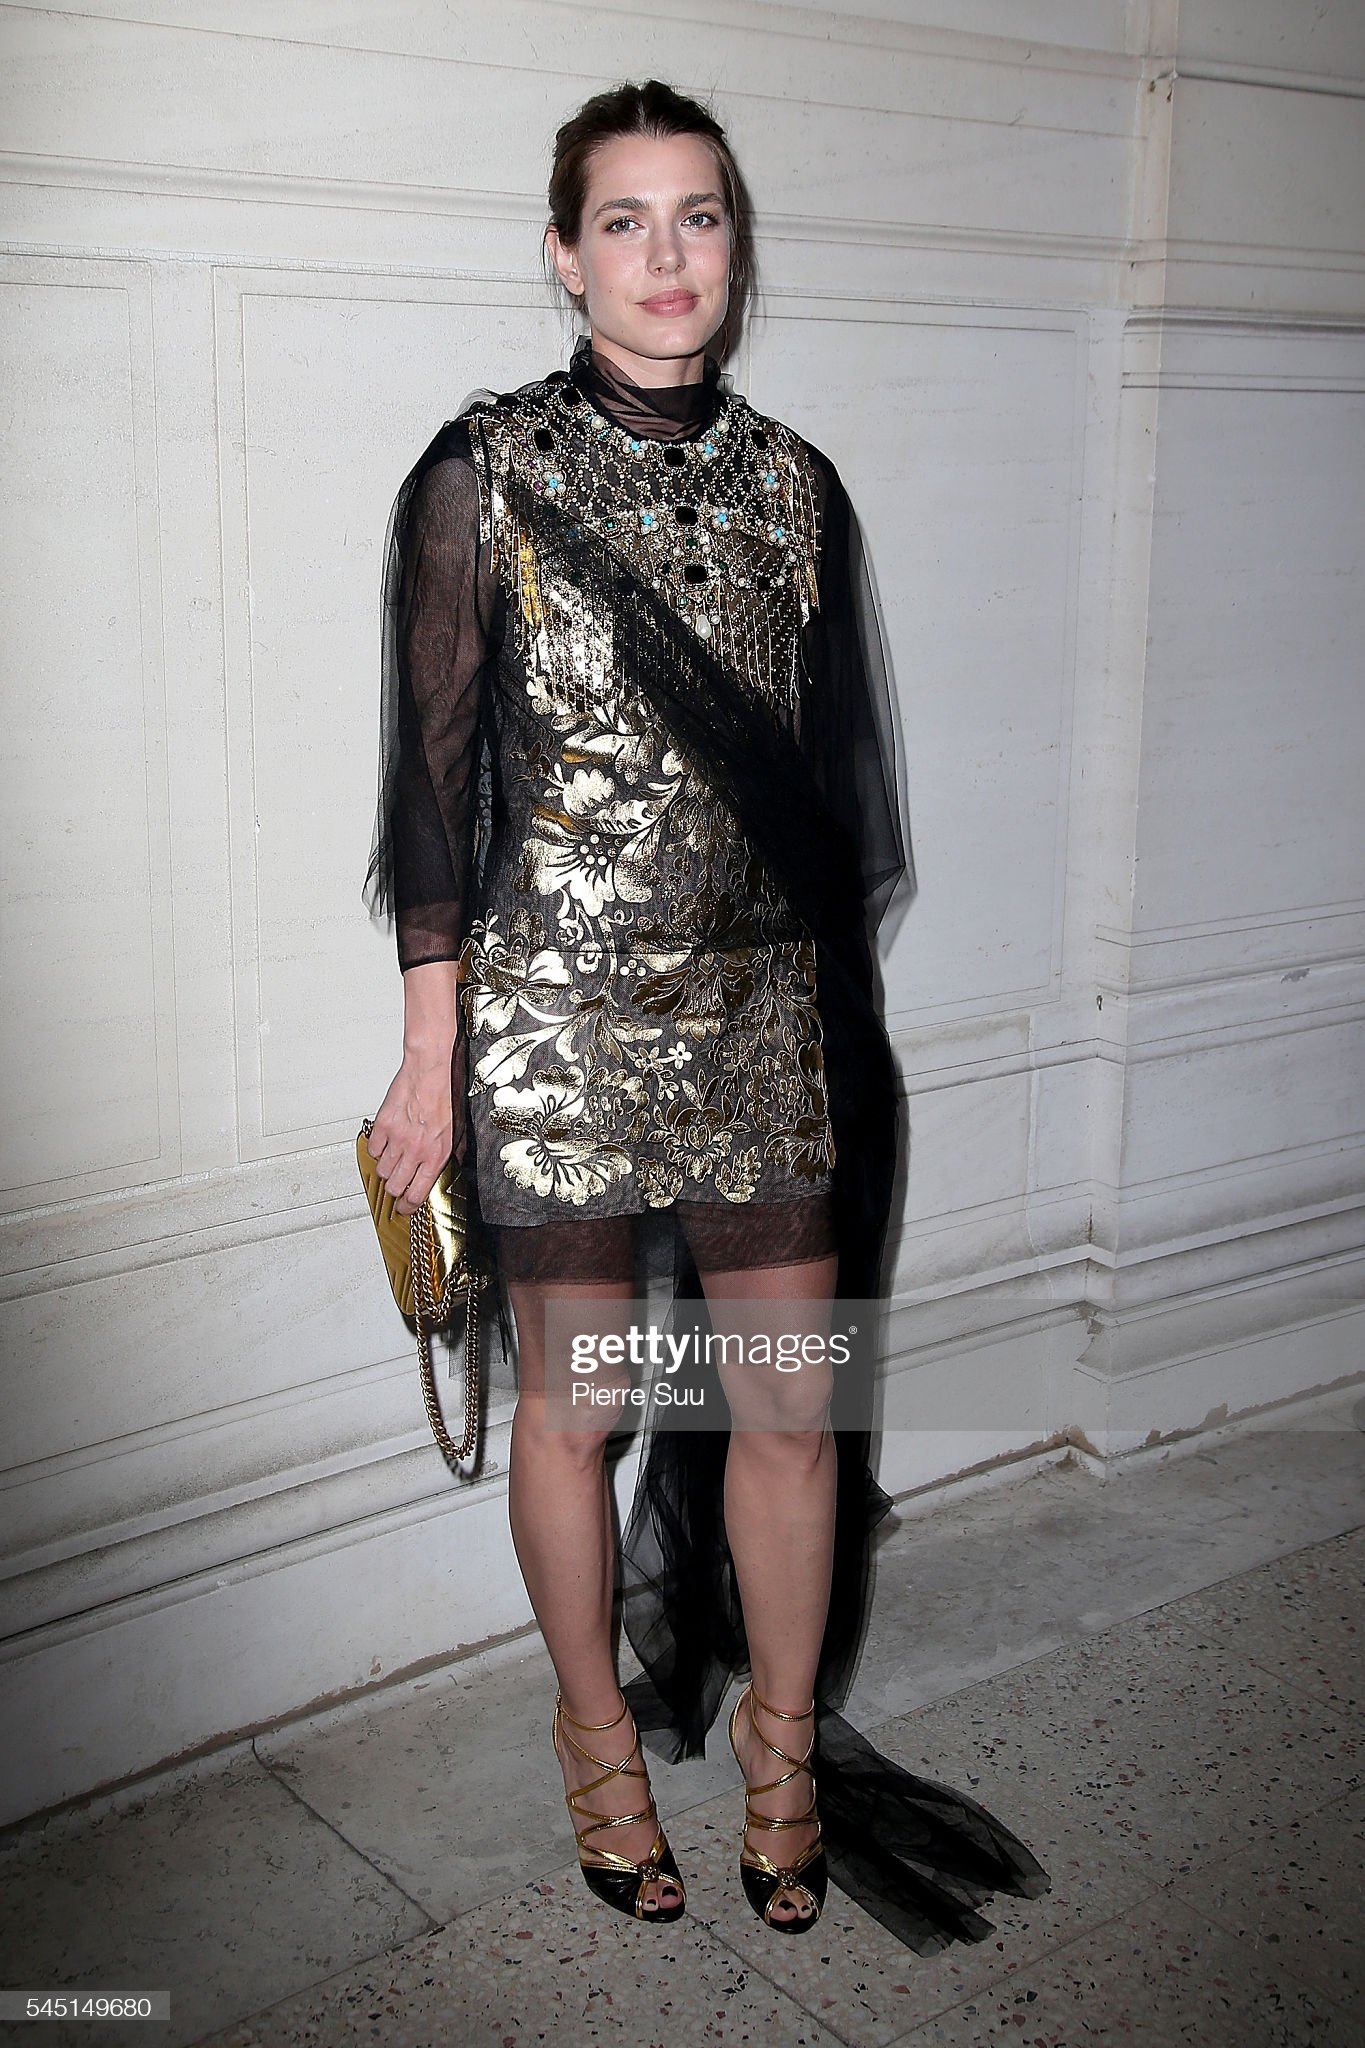 Vogue Foundation Gala 2016 - Photocall : News Photo